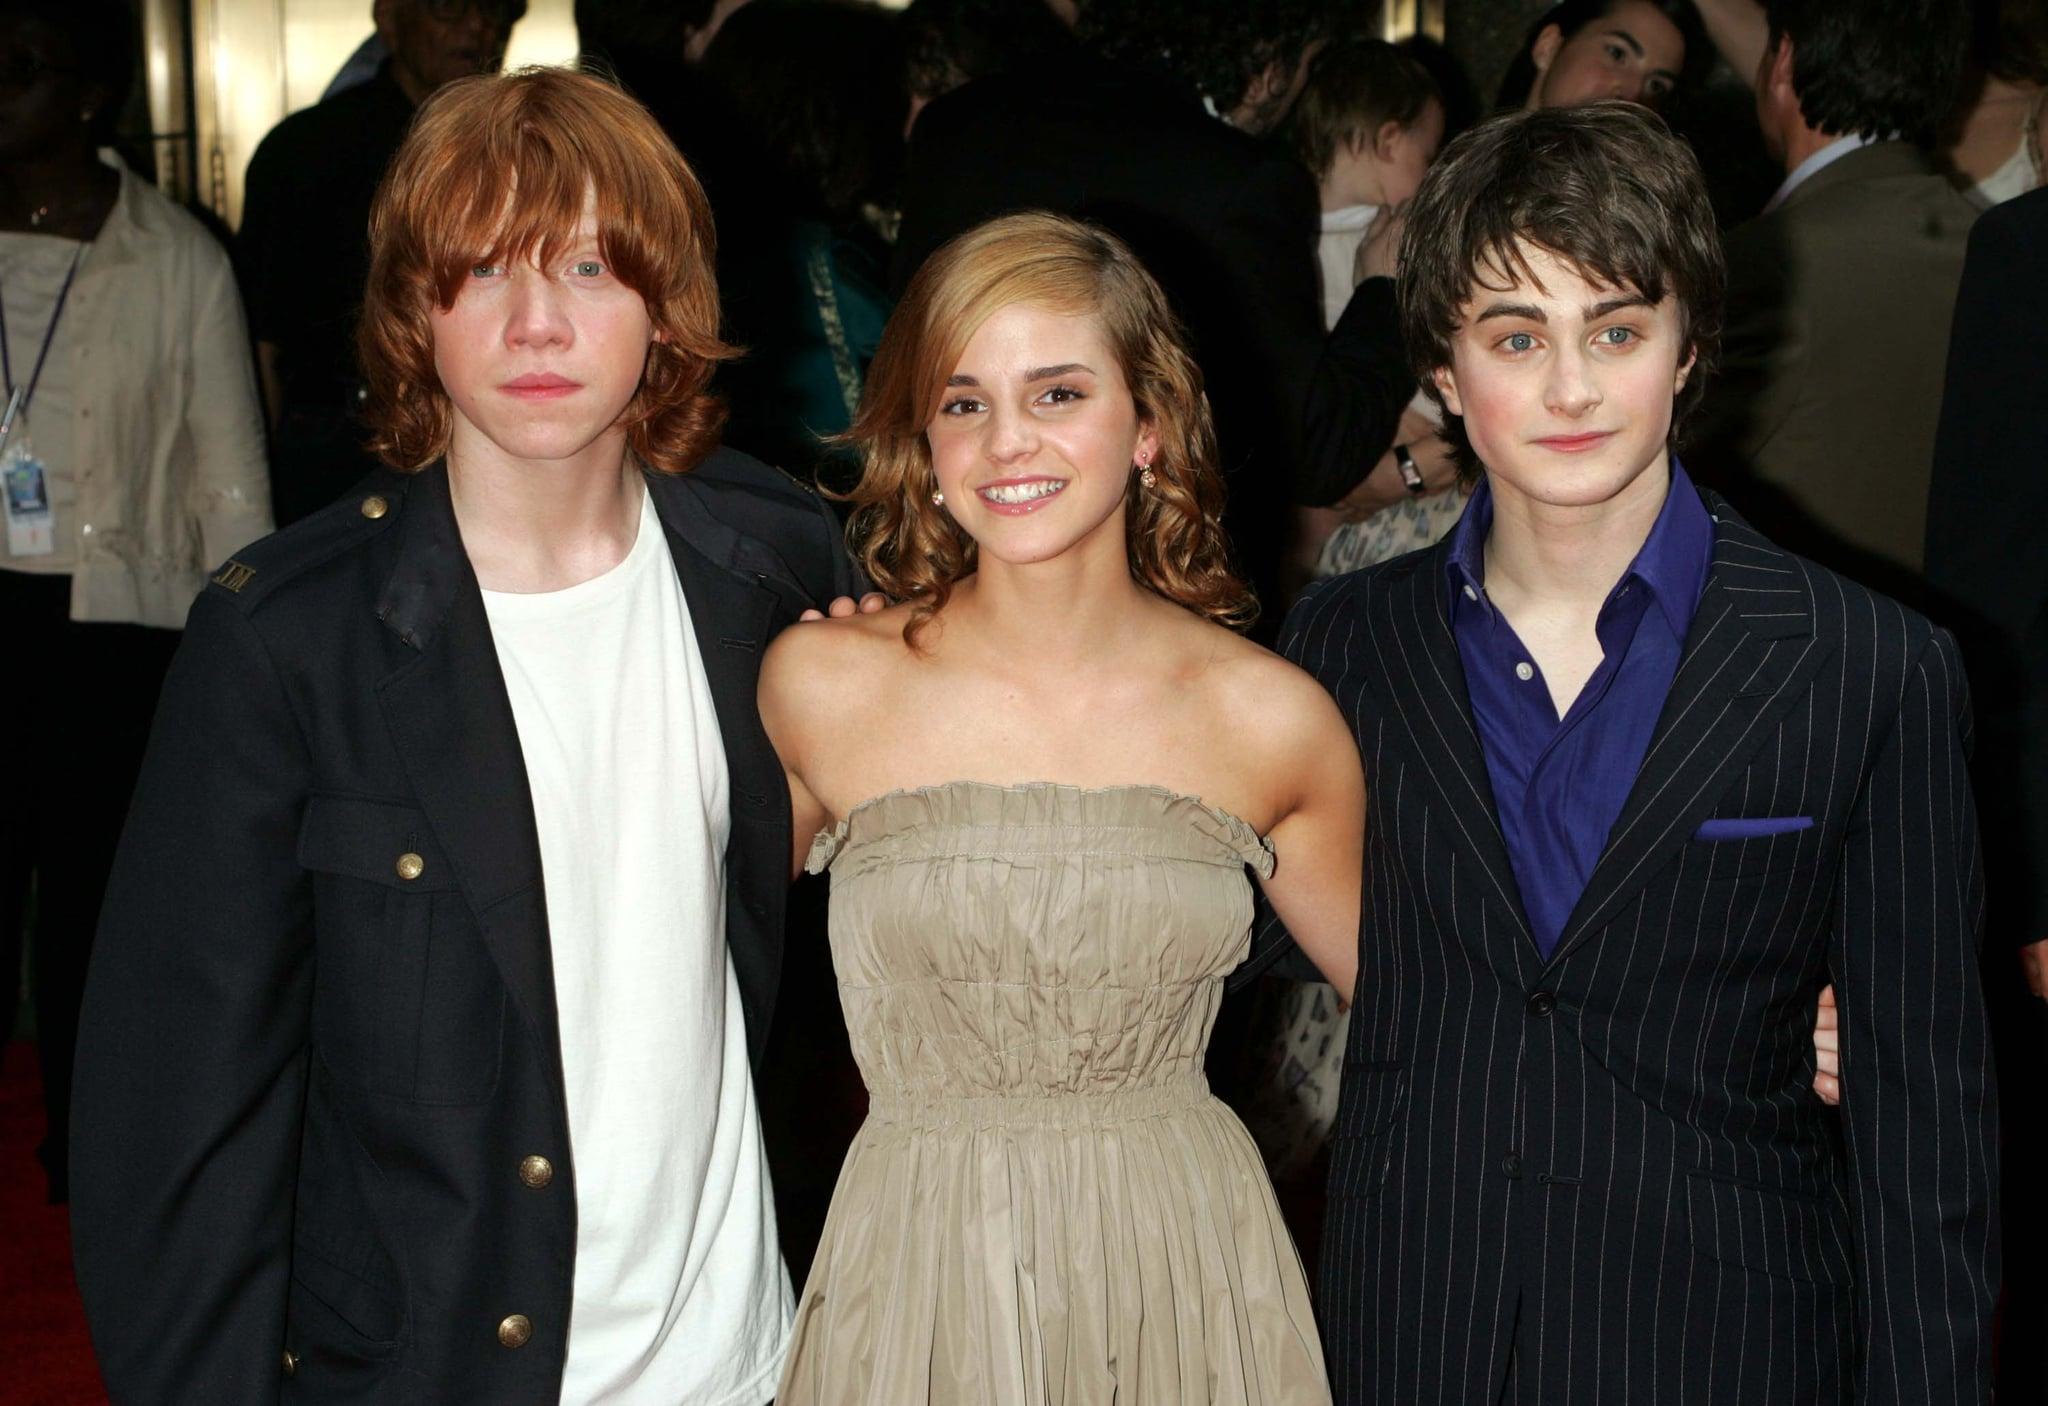 Harry Potter and the Prisoner of Azkaban Premiere (2004)